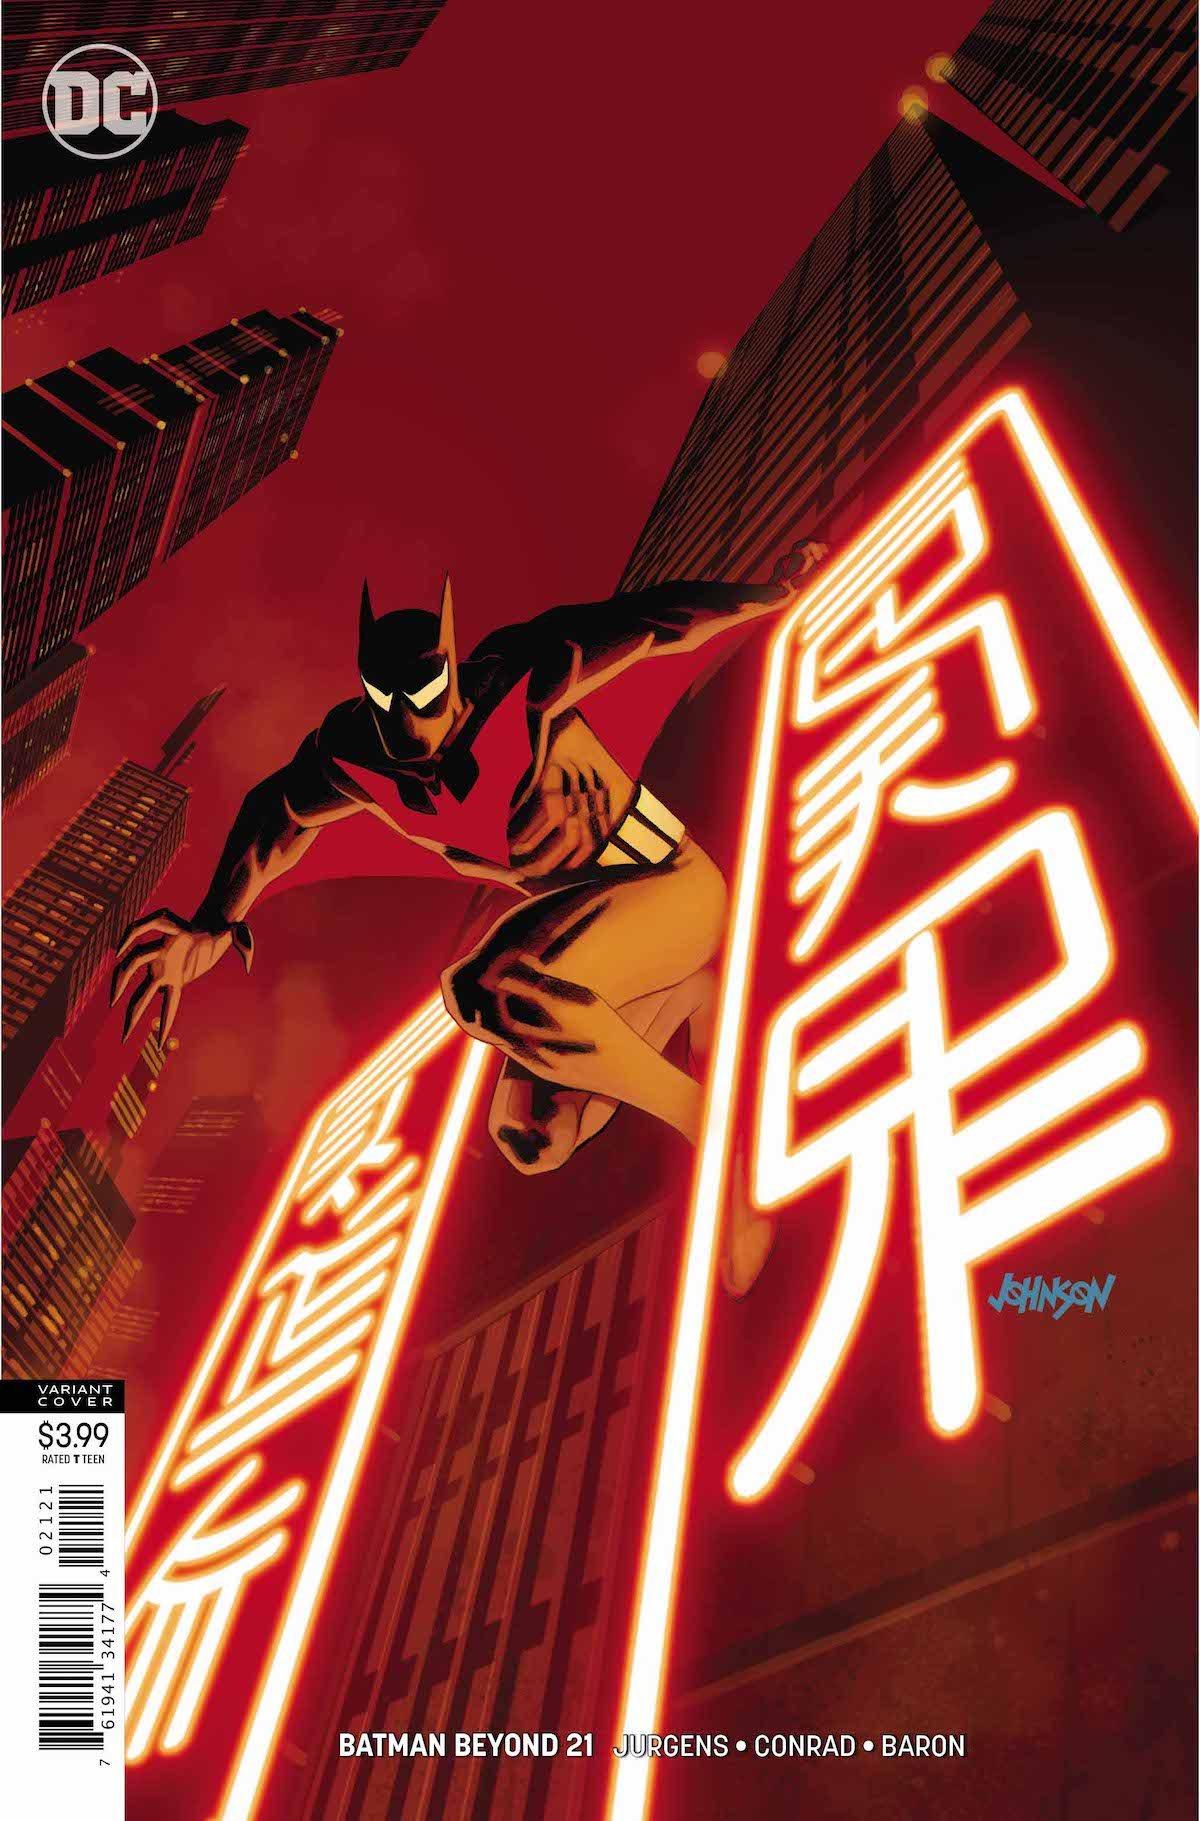 Batman Beyond #21 variant cover